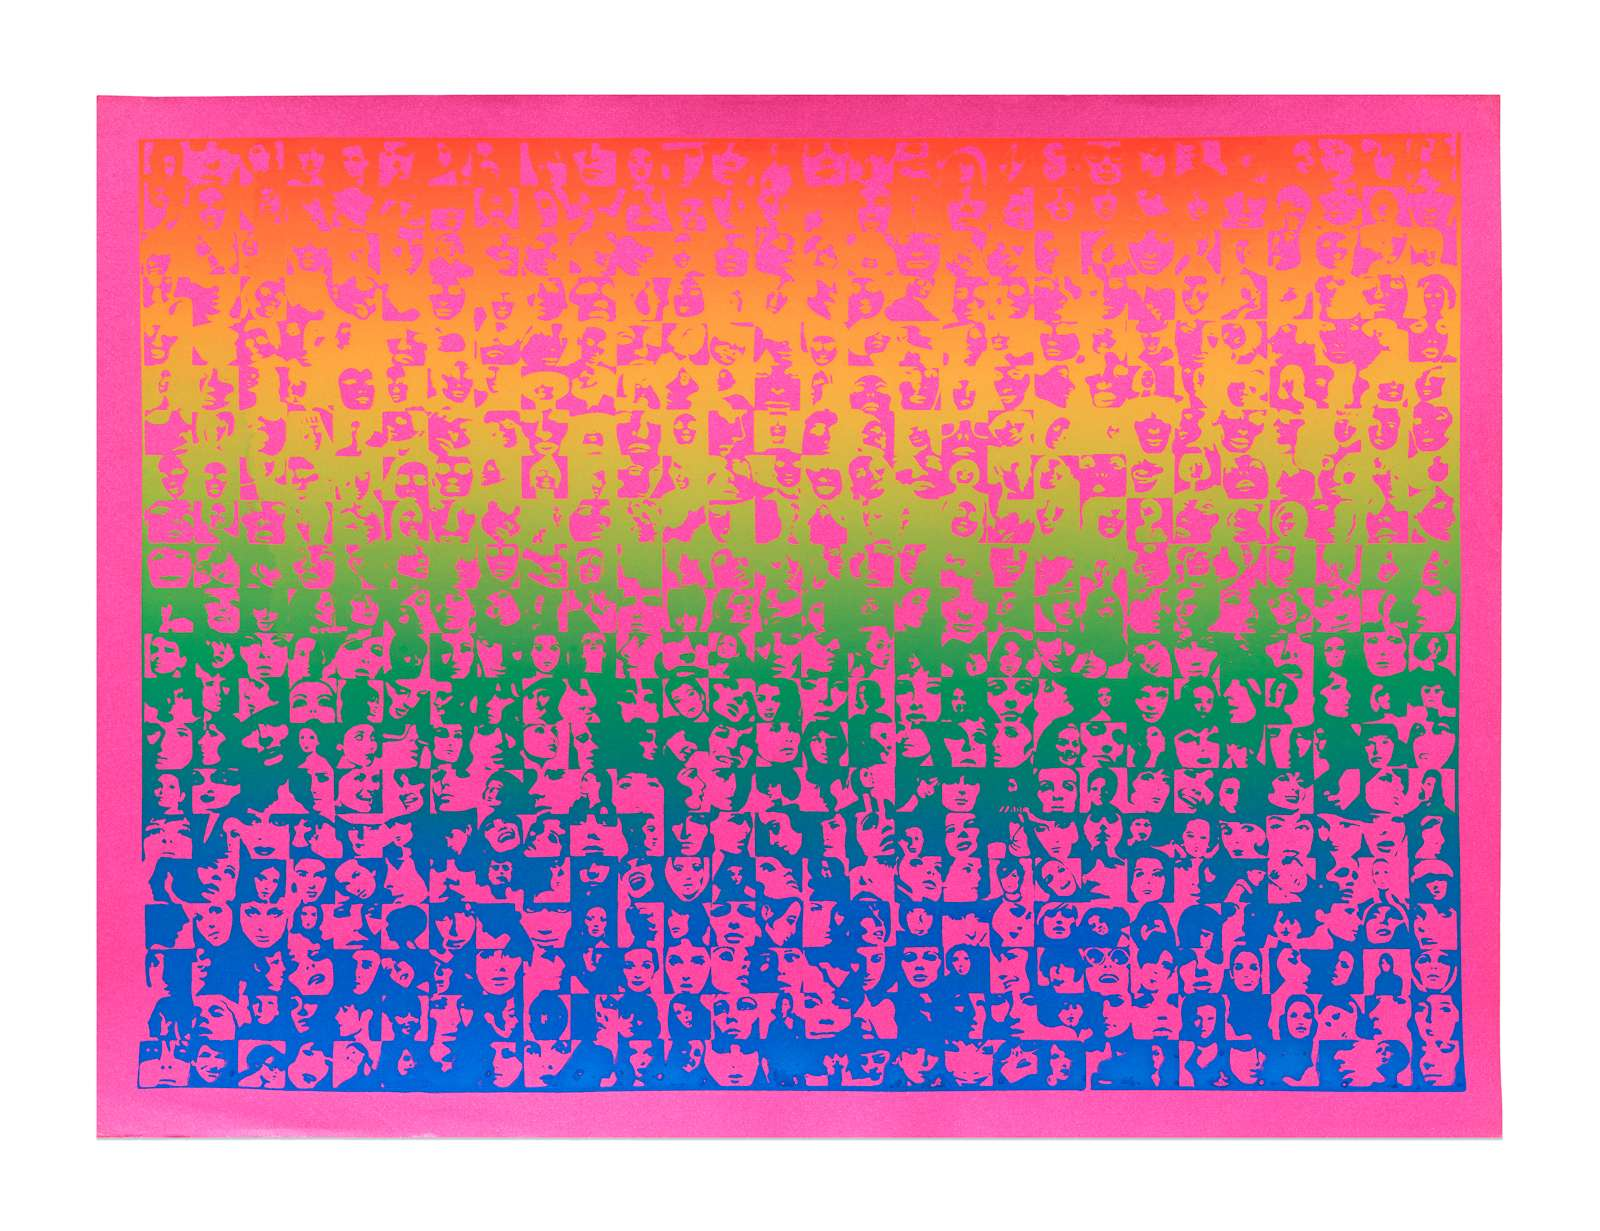 Roman Cieslewicz, Harem, 1968 Sérigraphie24.2 × 32.8 cm / 9 1/2 × 12 7/8 in.